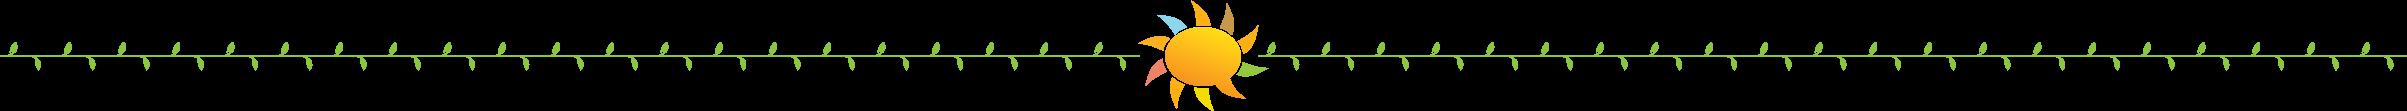 Ajatusrinki-logo-tekstinjakaja